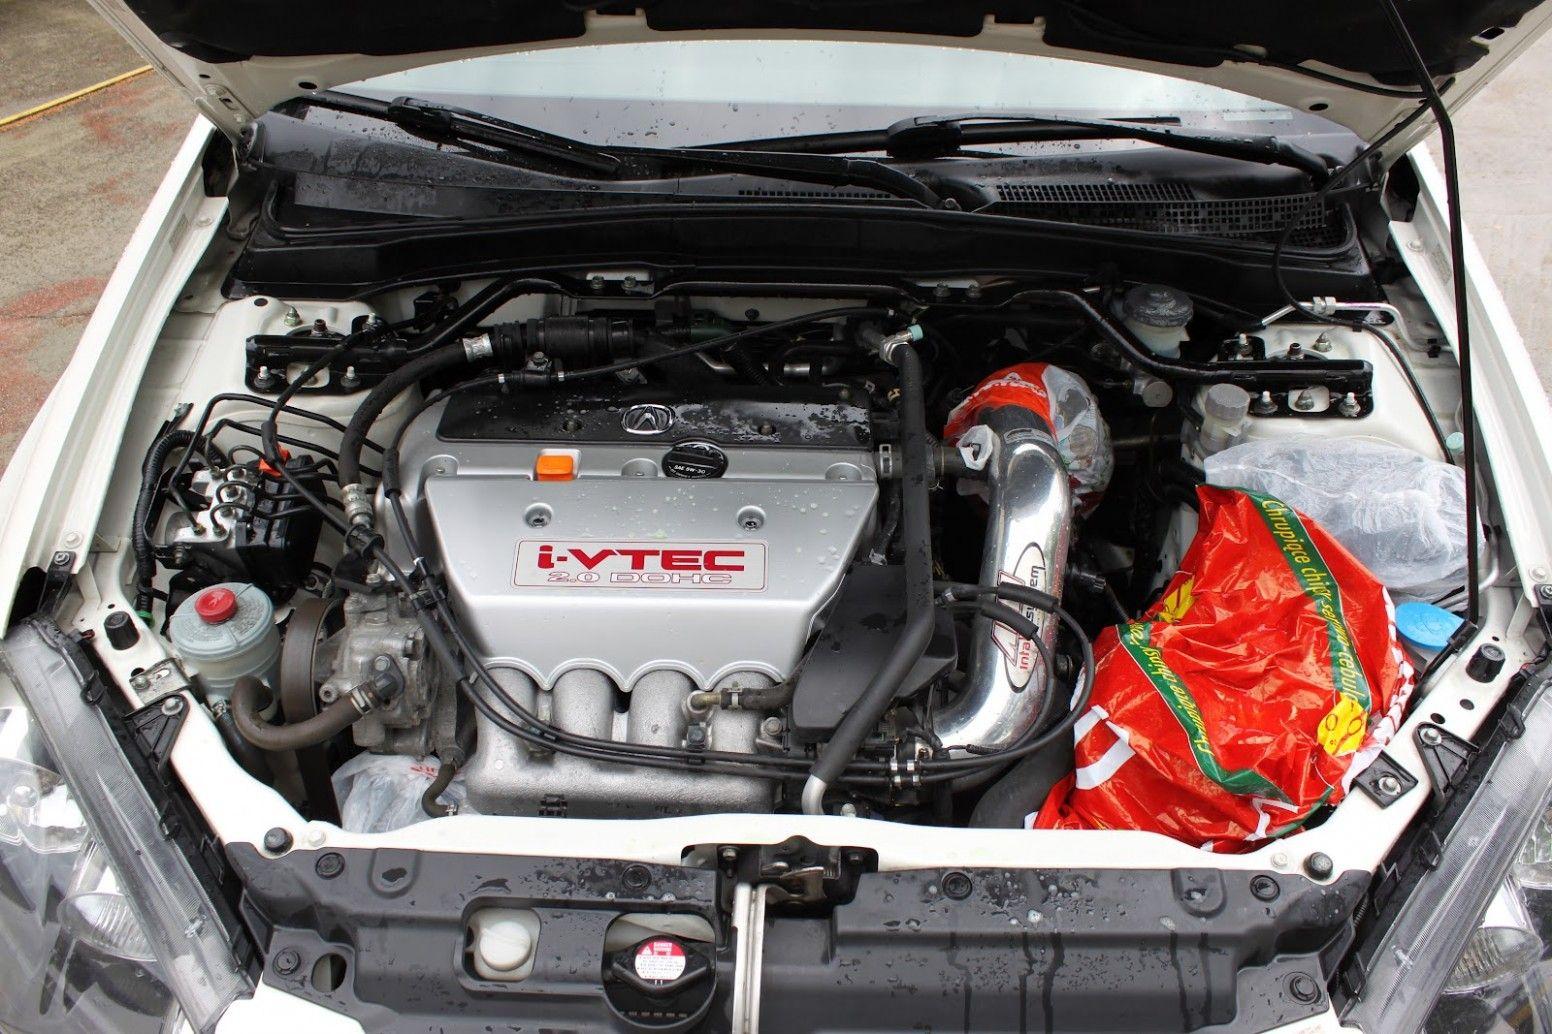 Rsx Engine Bay Diagram | Acura Rsx Engine Bay Diagram |  | Pinterest